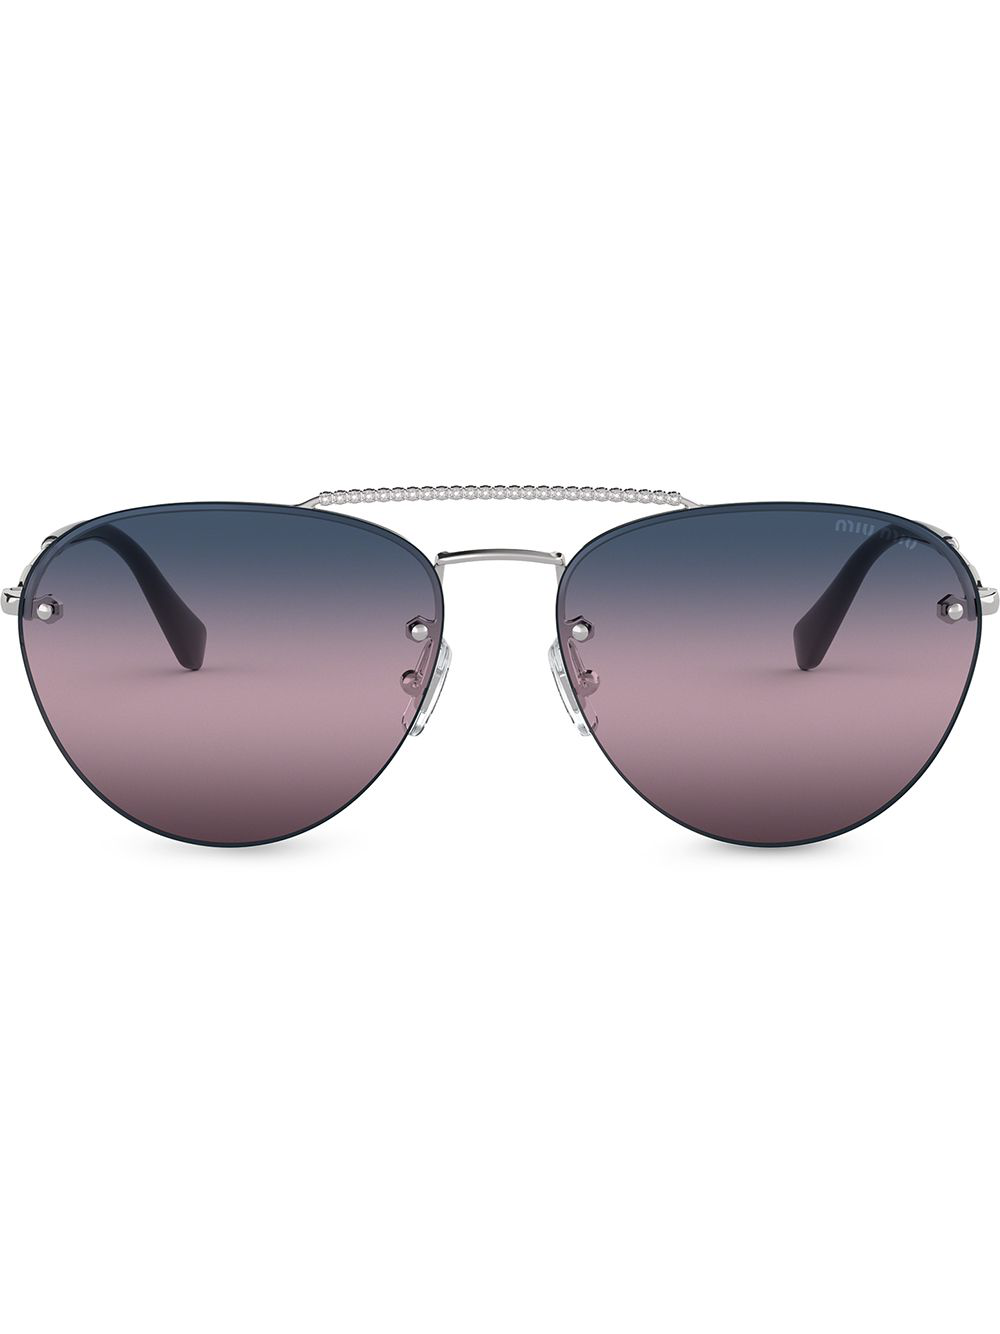 1d0c97328a7 Miu Miu Eyewear Klassische Pilotenbrille - Schwarz In Black